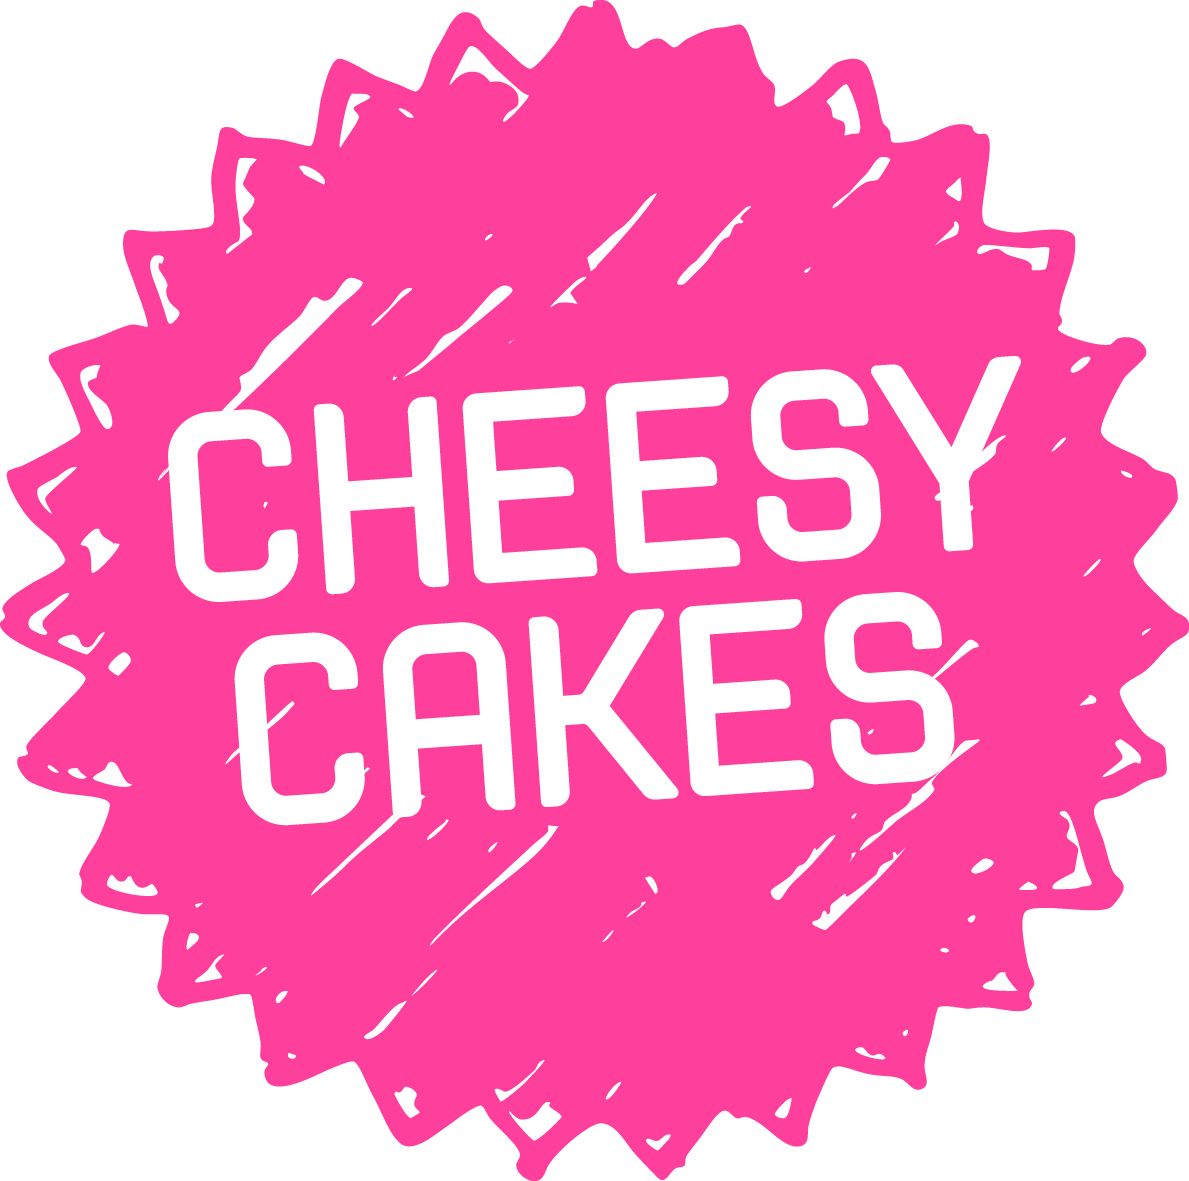 Cheesy-cakes_logo_pink.jpg